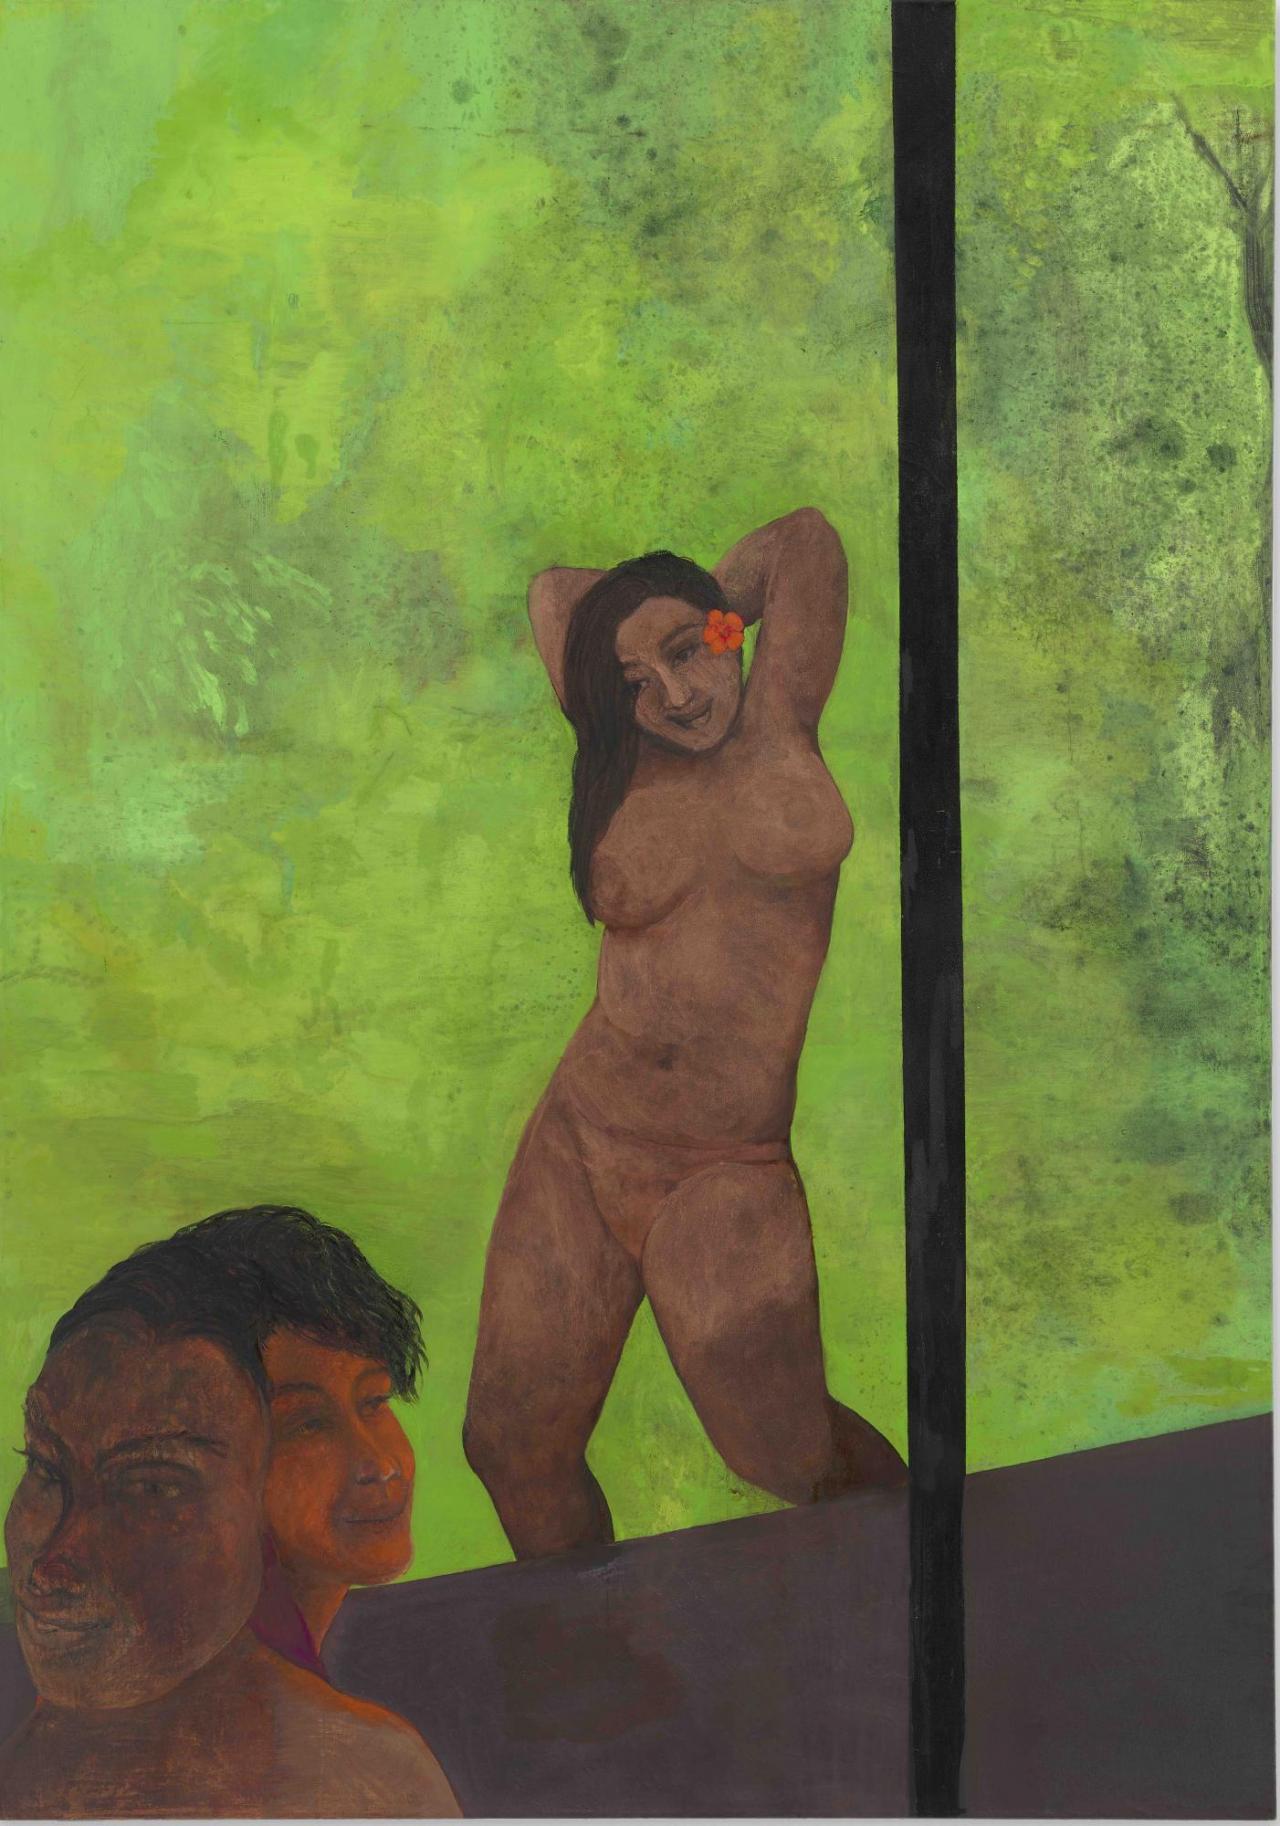 Stanislava Kovalcikova, Weight of Light , 2020, Oil and ink on canvas, 175 x 120 cm